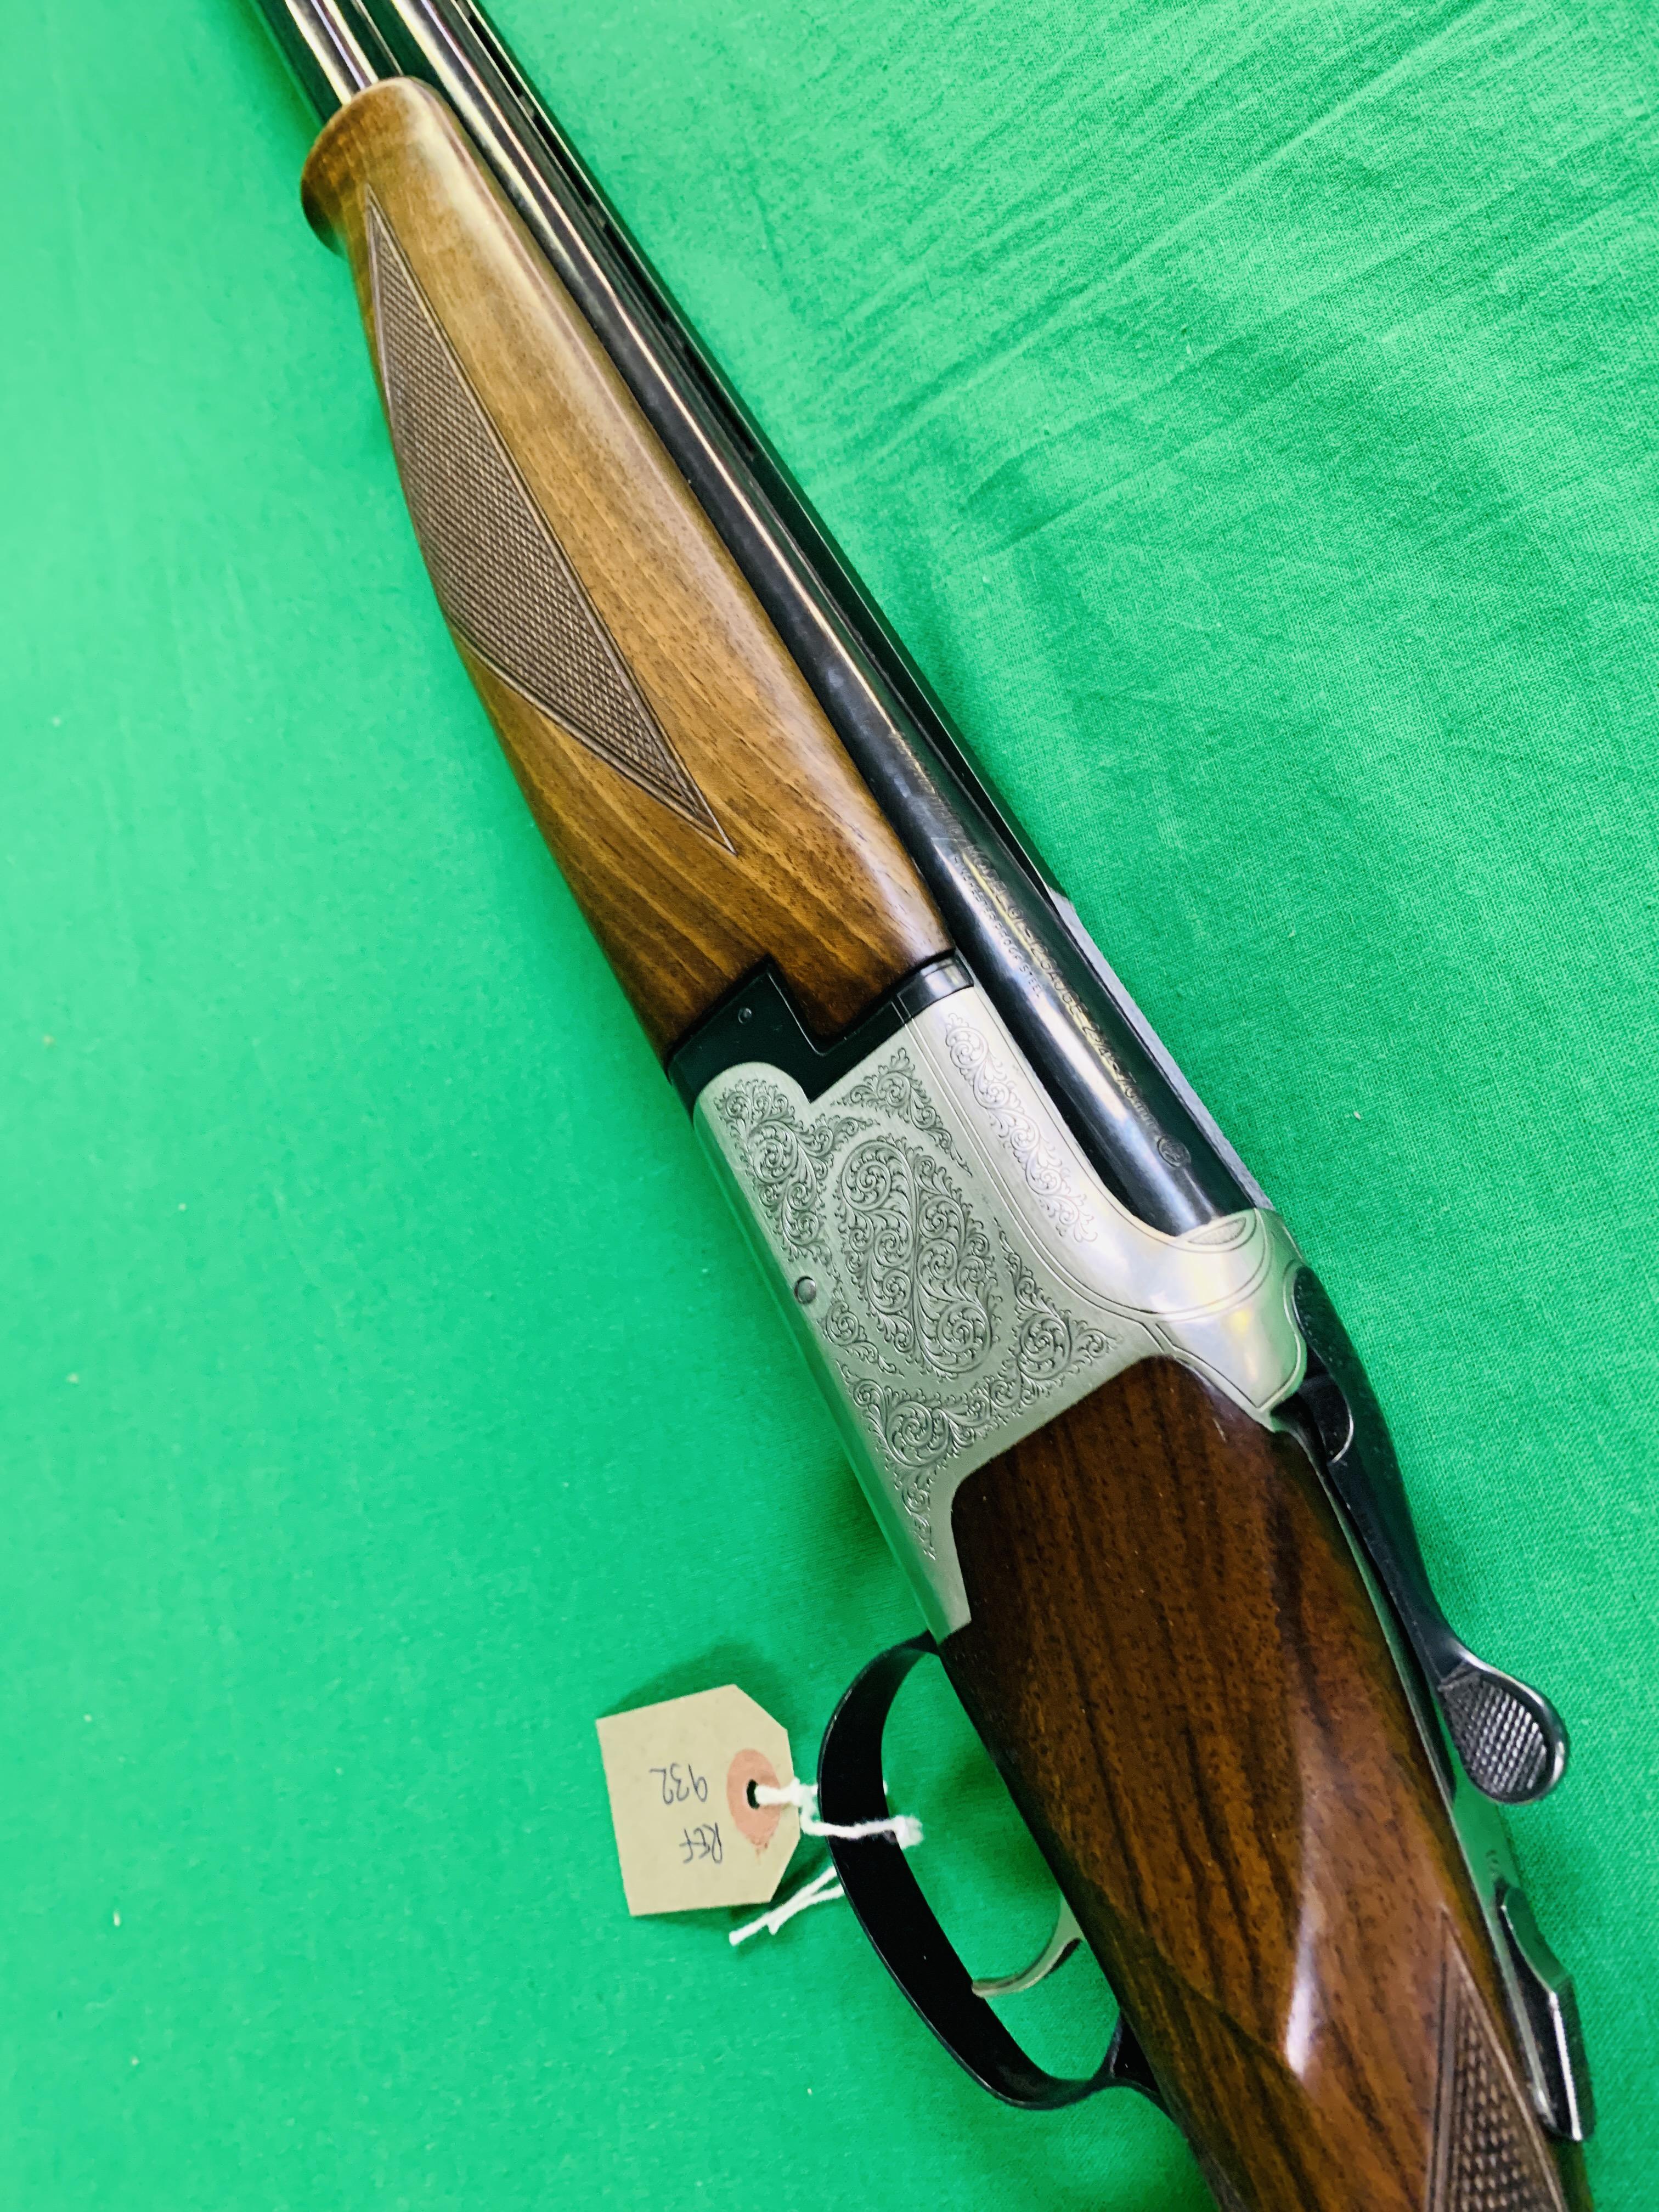 WINCHESTER MODEL 91 12 BORE OVER AND UNDER SHOTGUN # 232623 28 INCH BARRELS, - Image 7 of 8